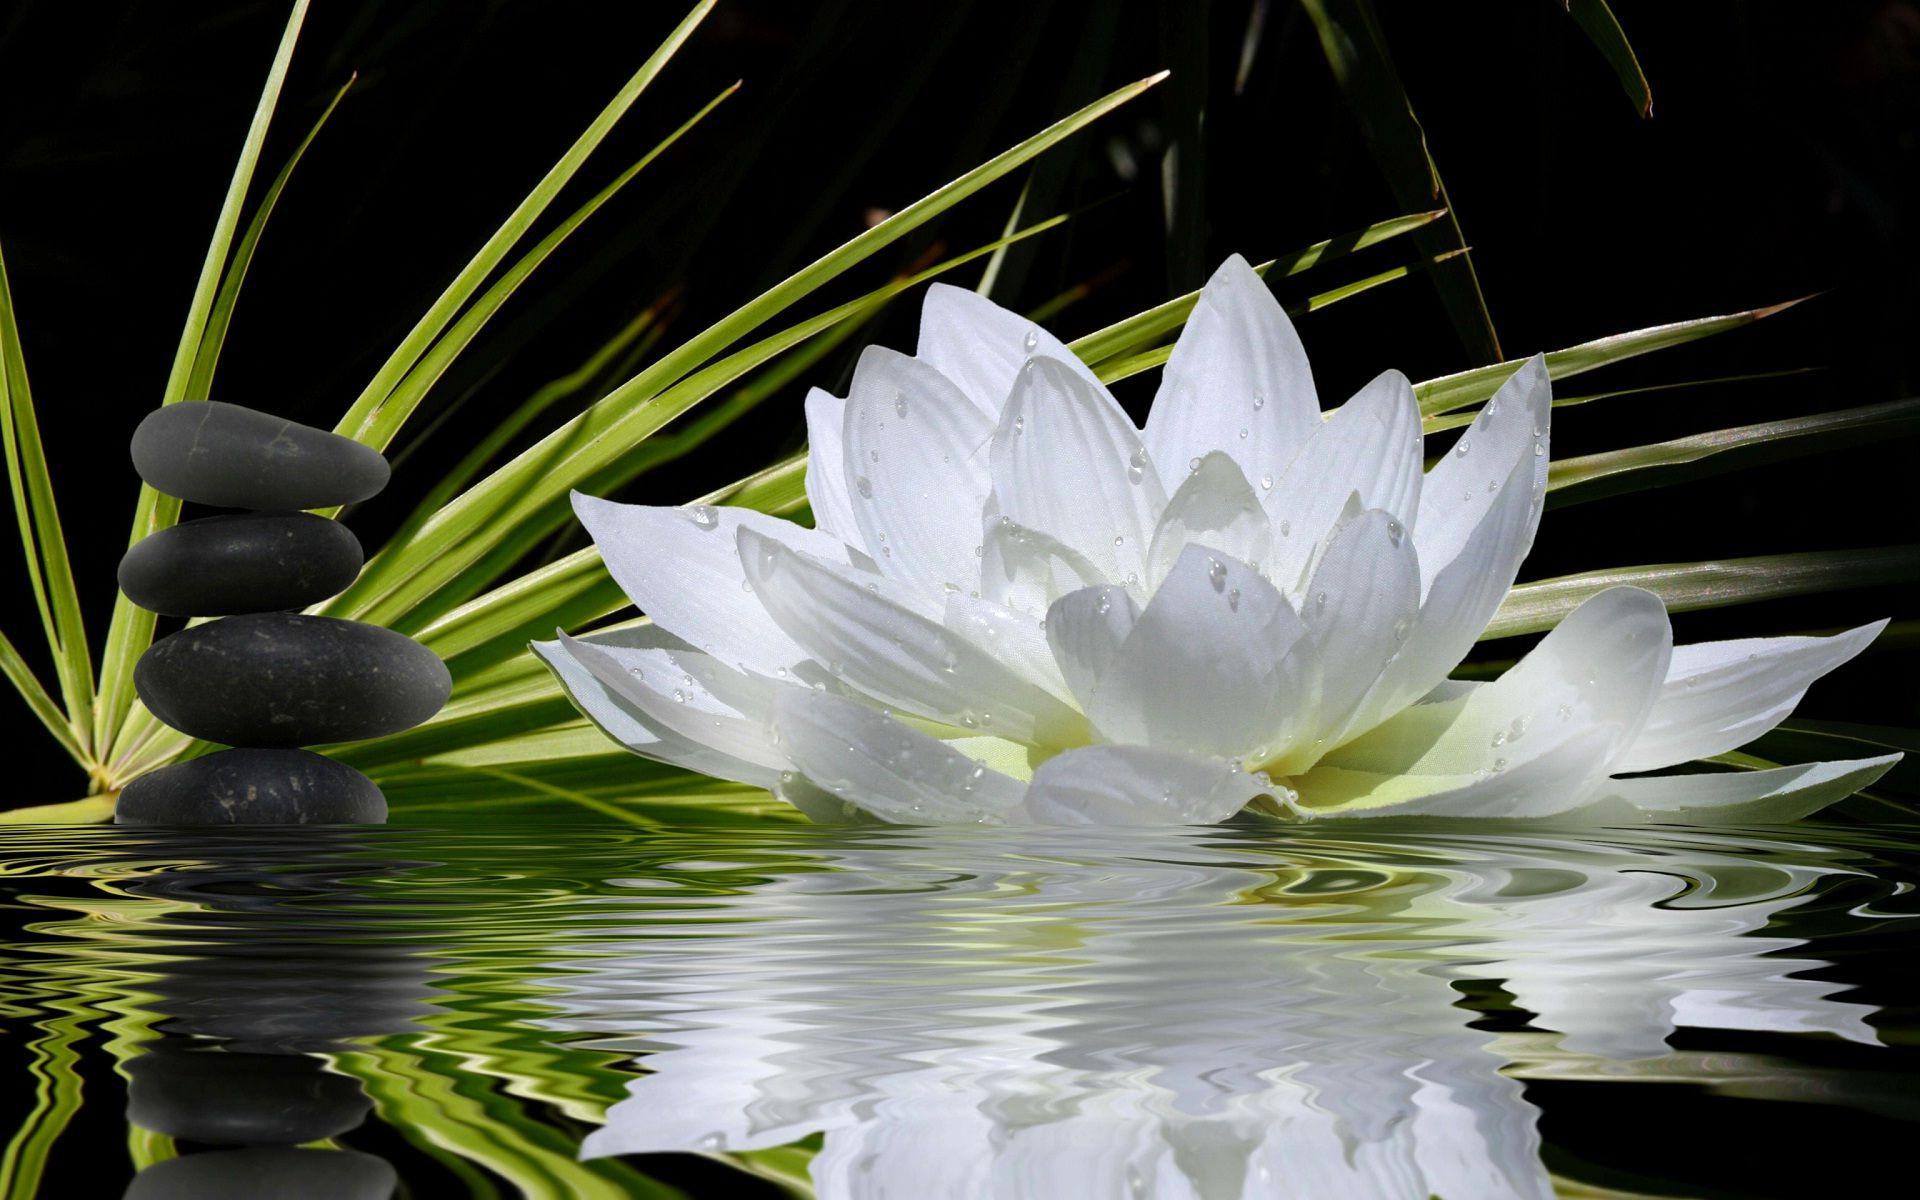 Black Lotus Flower Wallpapers High Resolution Cruzes